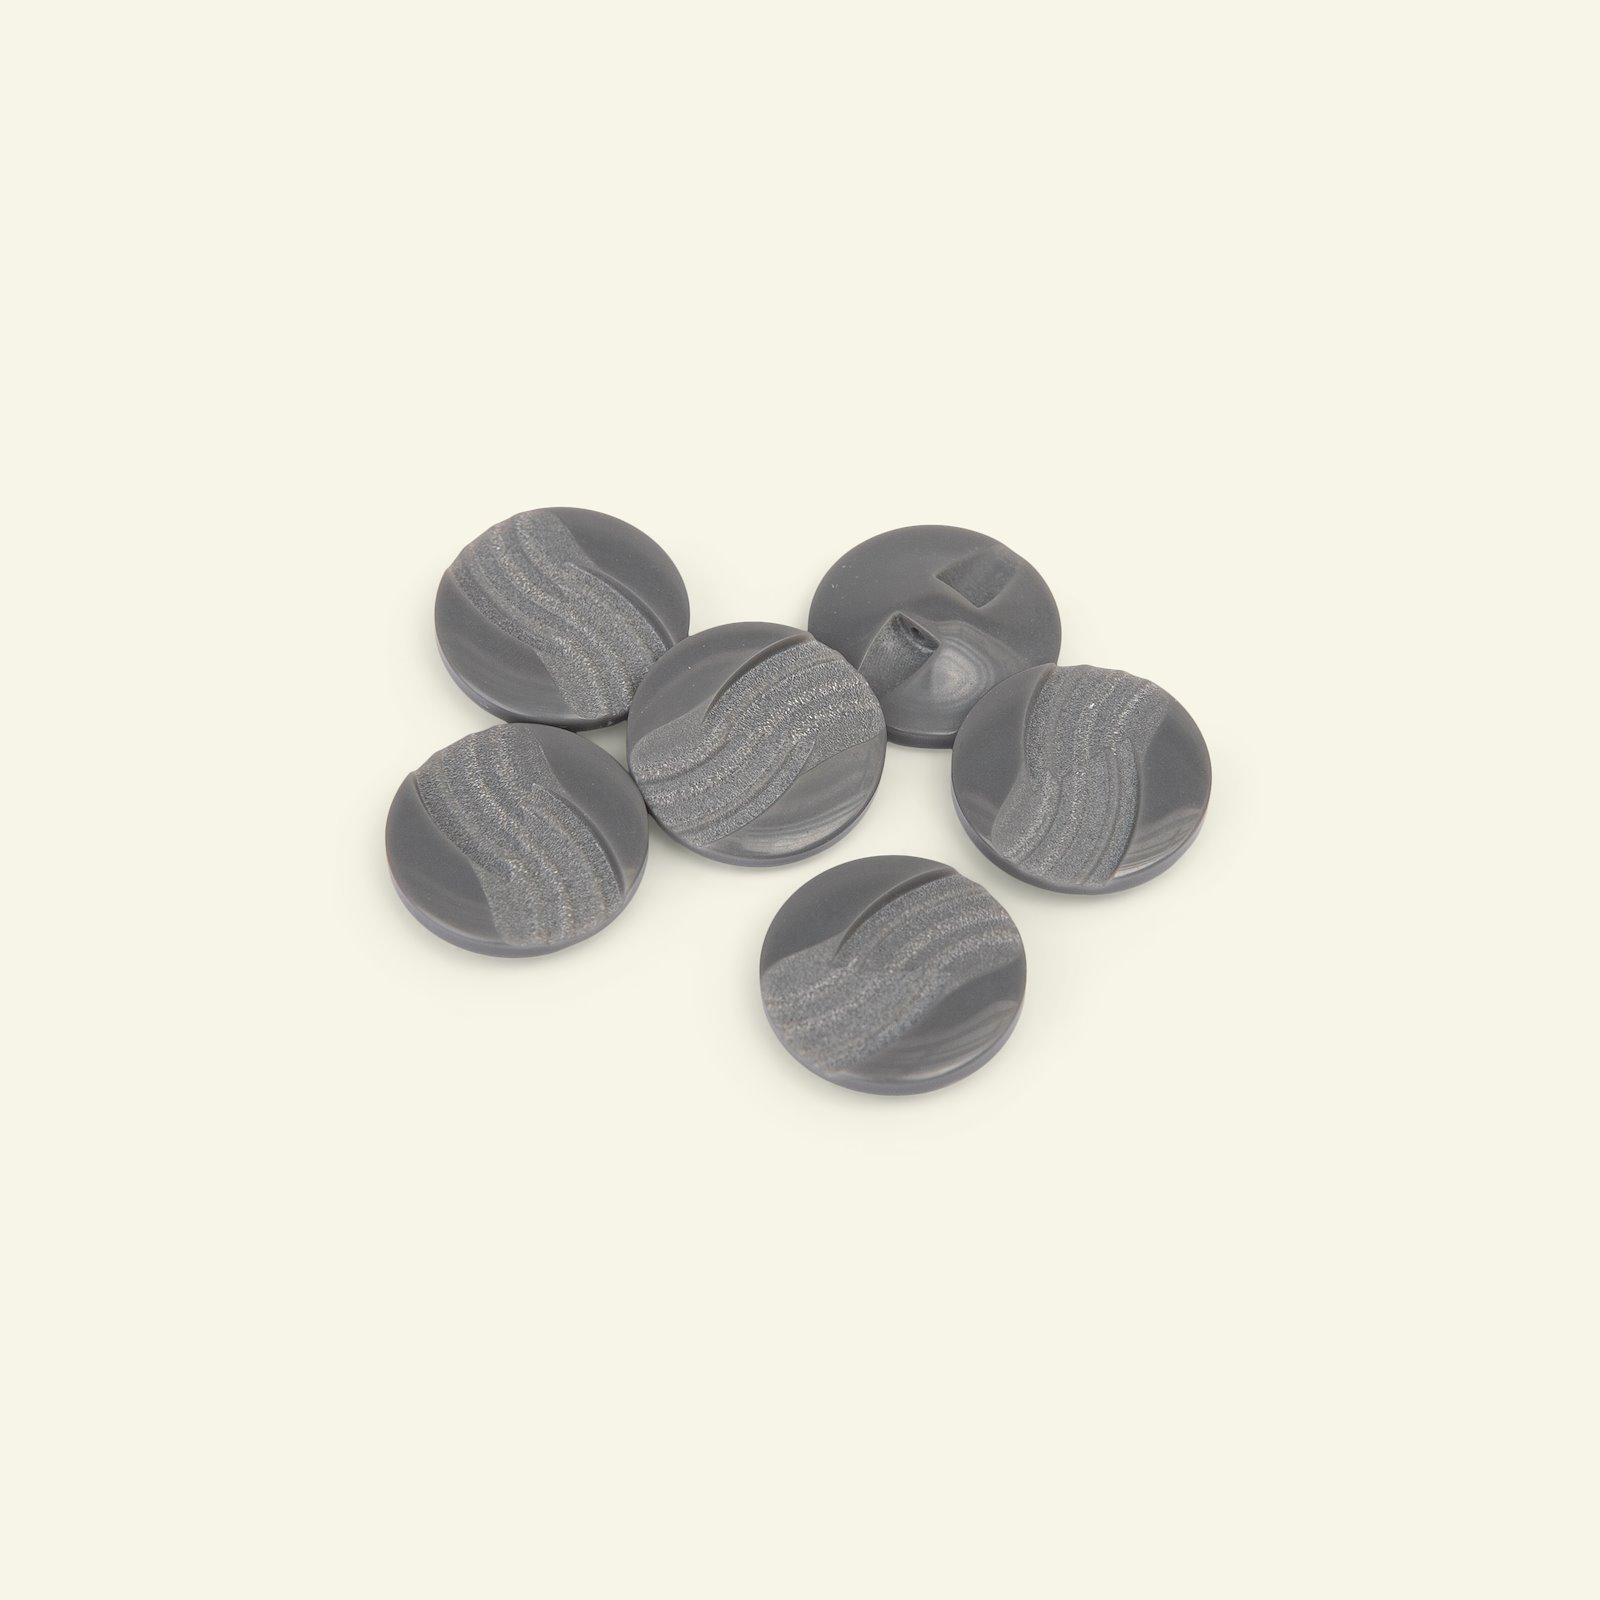 Shank button waves 18mm dark grey 6pcs 33193_pack